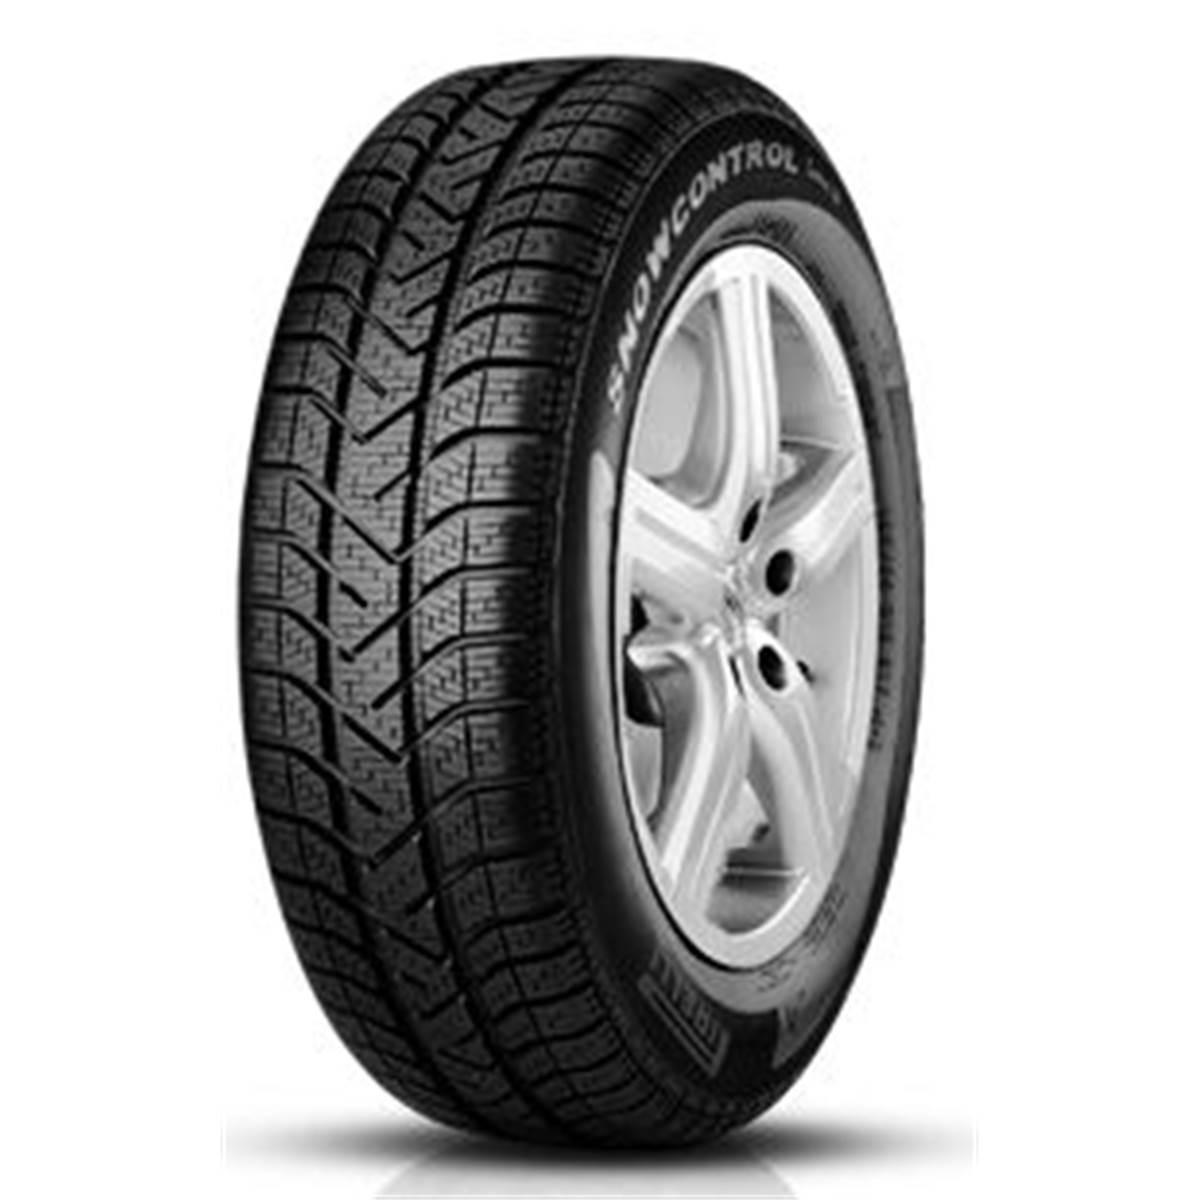 Pneu Hiver Pirelli 175/65R15 84H Winter 210 Snowcontrol Iii